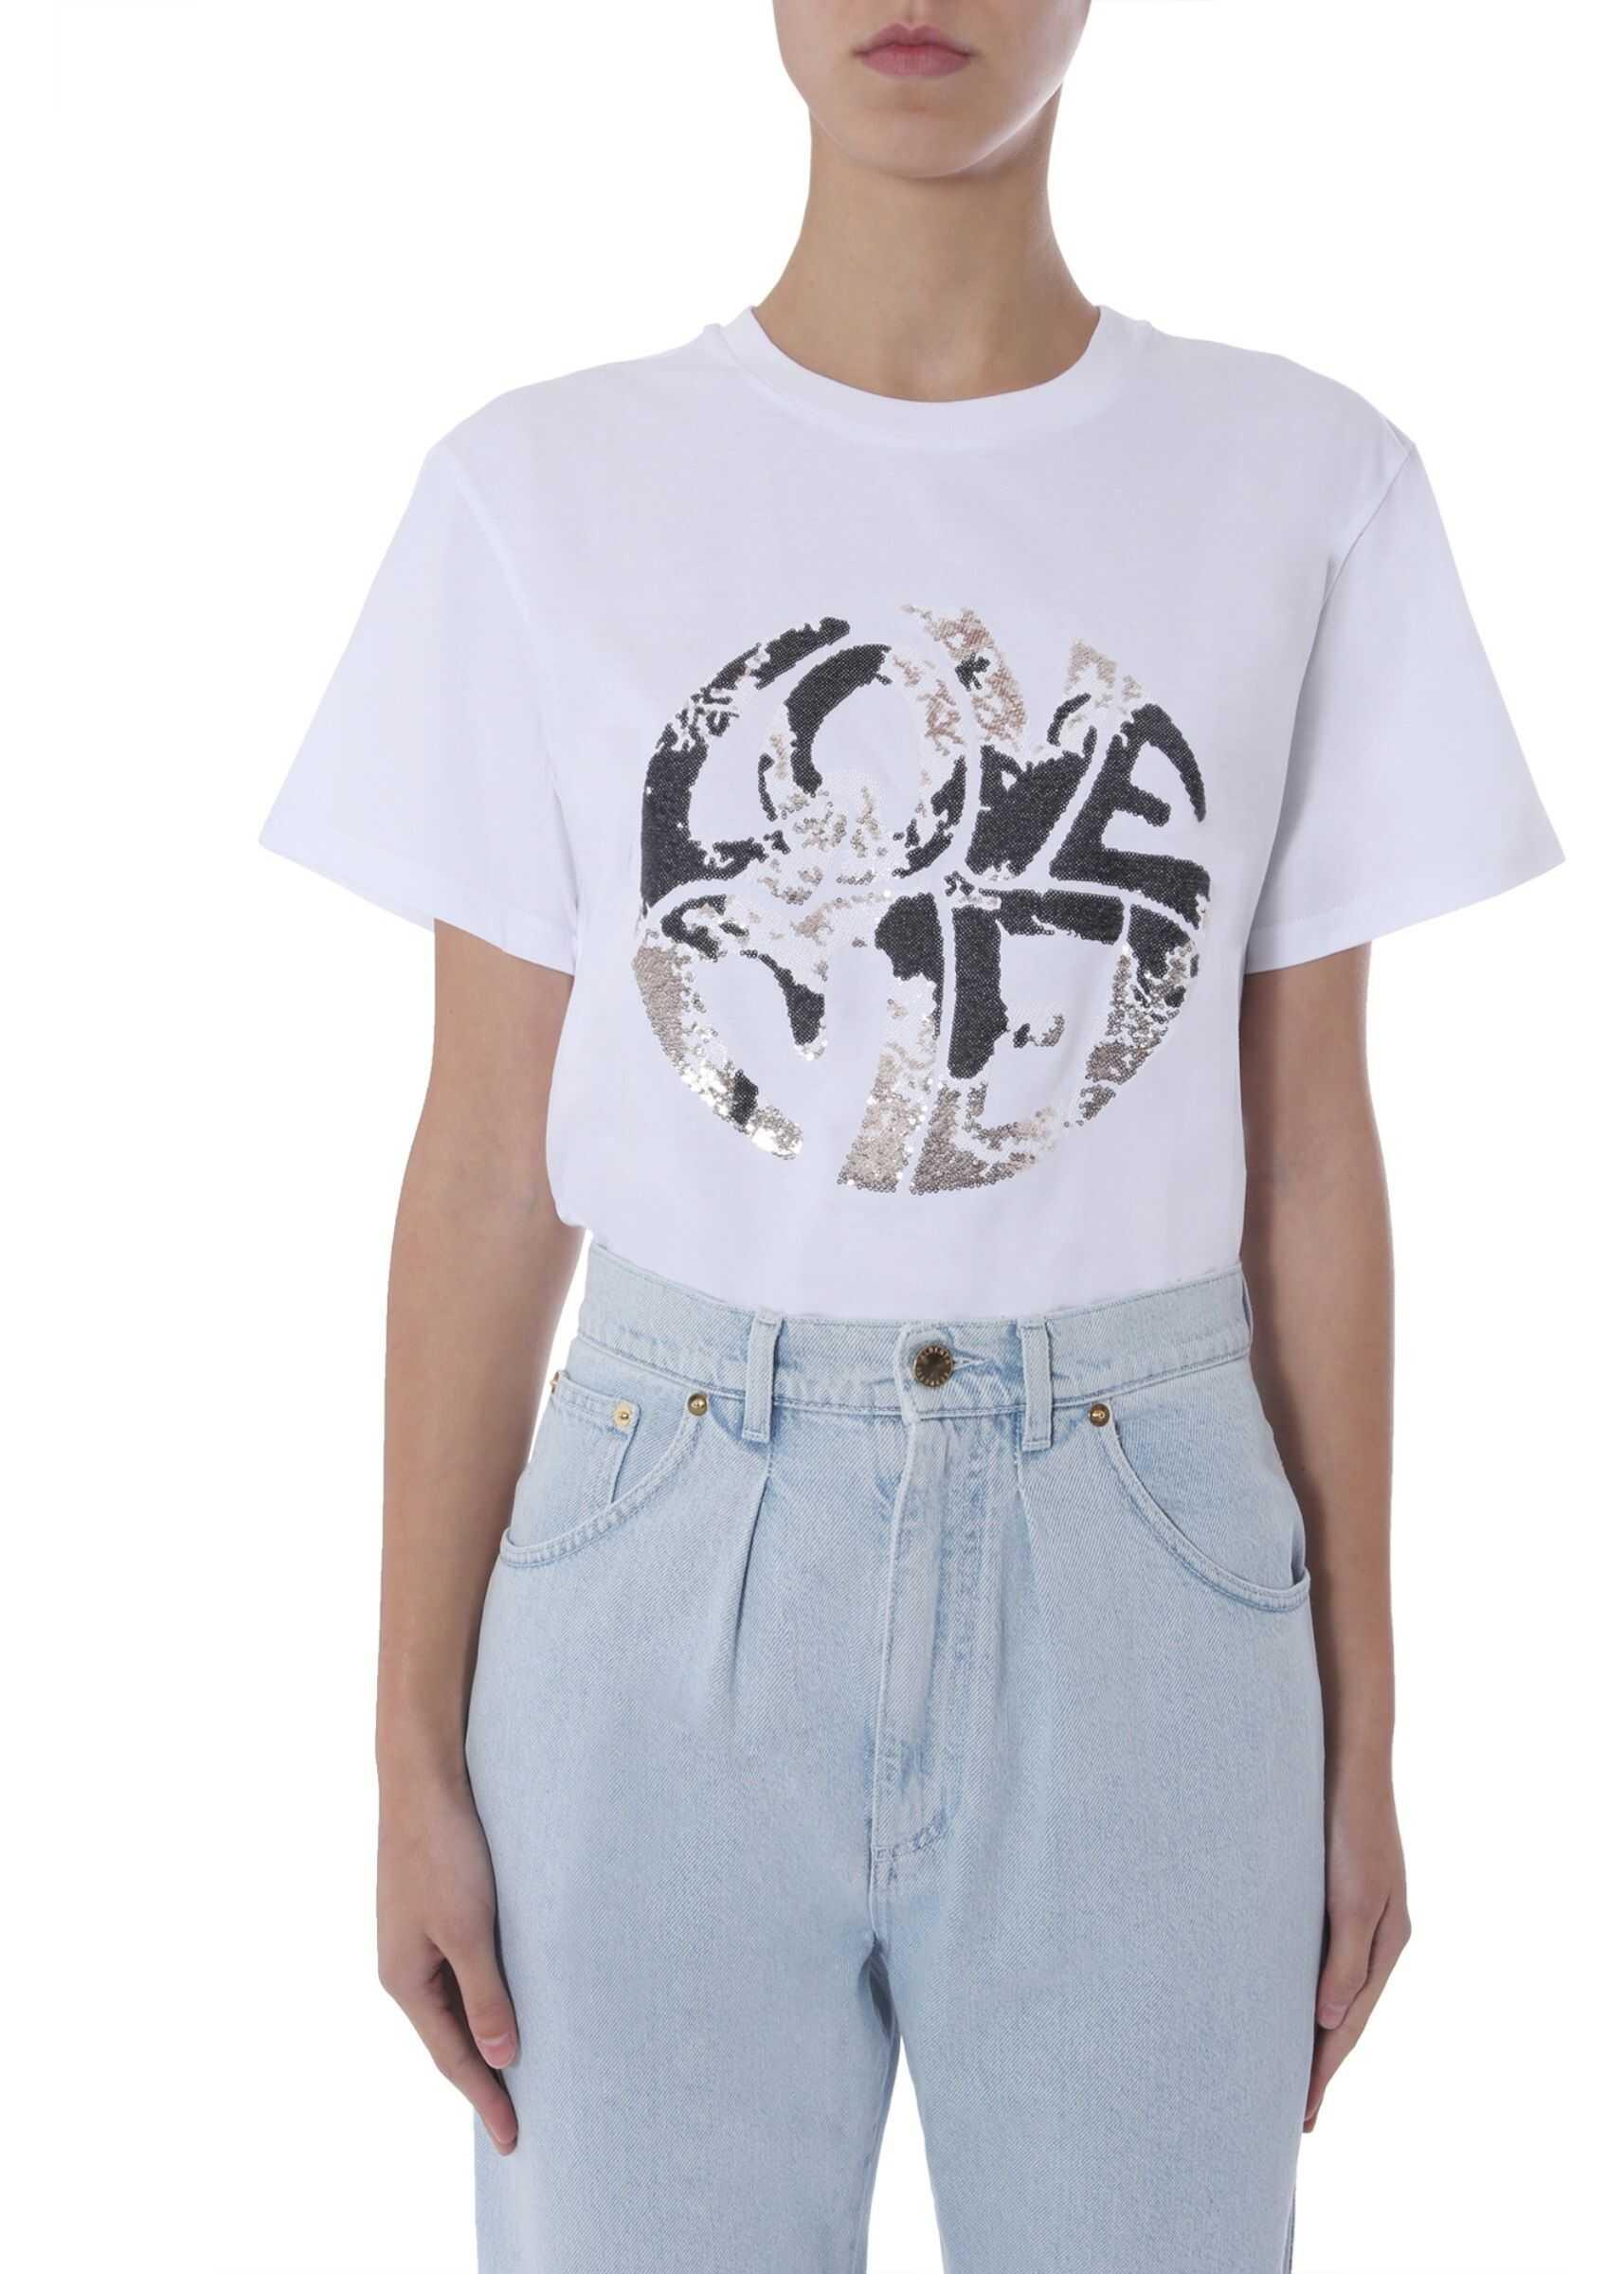 Alberta Ferretti Crew Neck T-Shirt WHITE